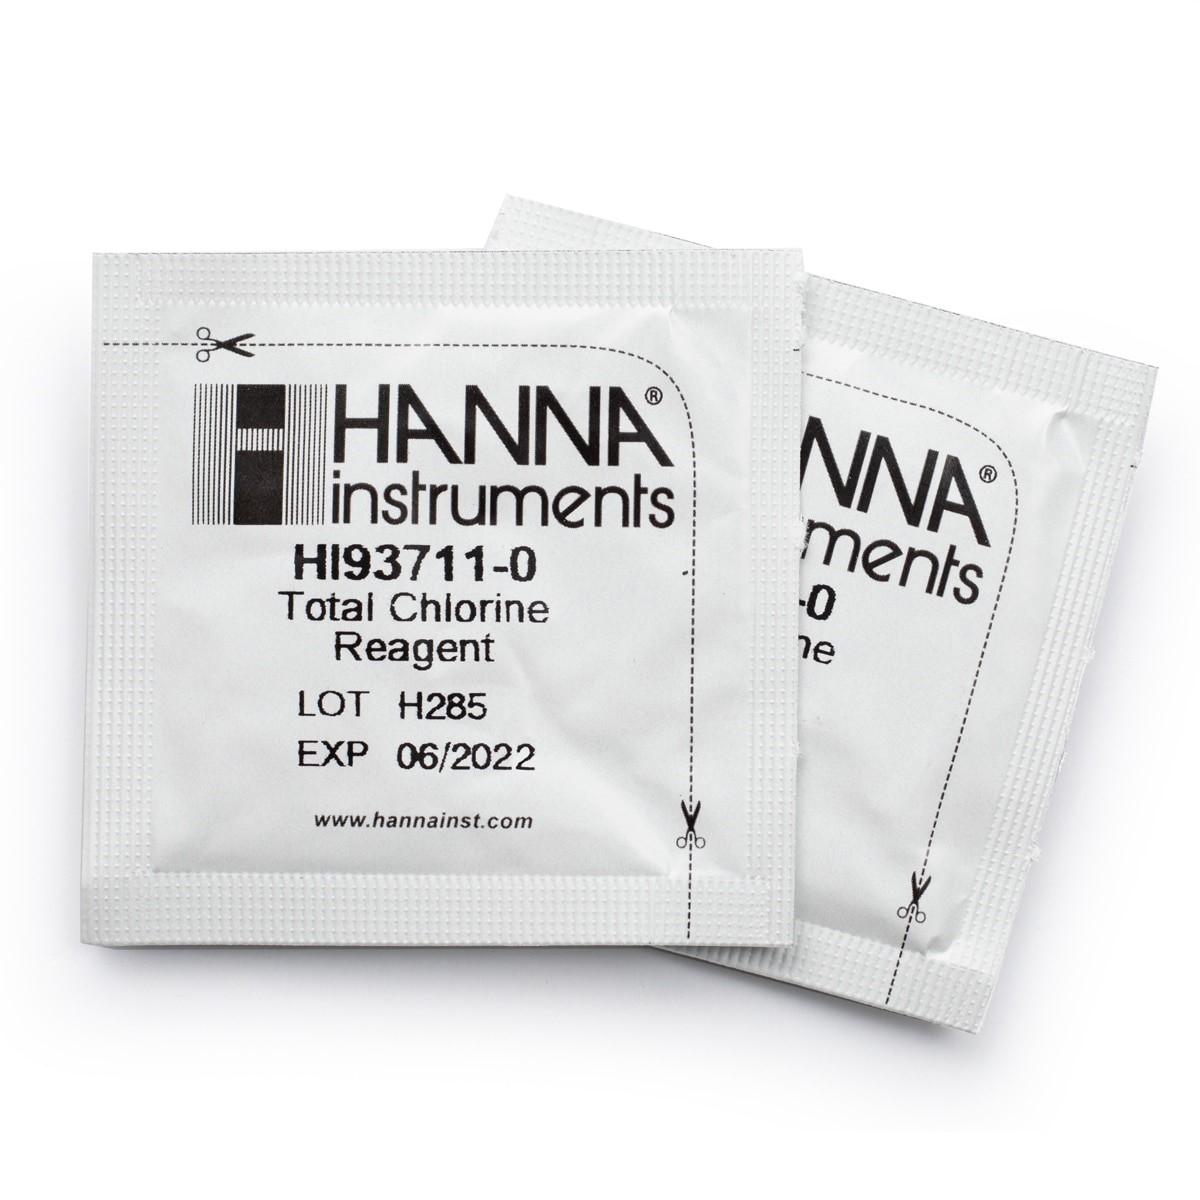 HI93711-03 Total Chlorine Reagents (300 tests)